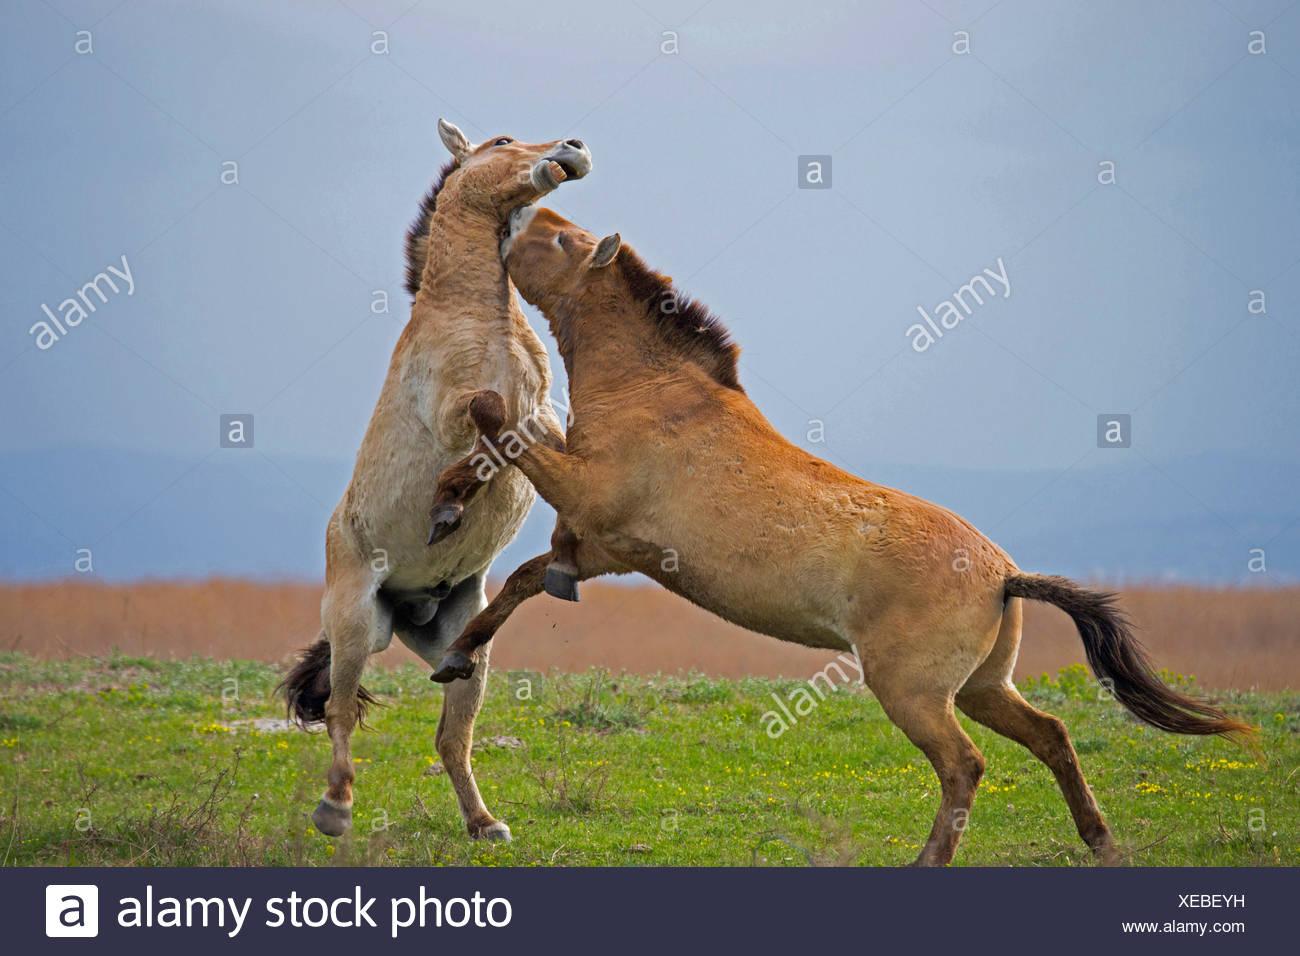 Przewalskis Horse, Mongolian Wild Horse (Equus ferus przewalskii) Stallions fighting Lake Neusiedl Austria - Stock Image